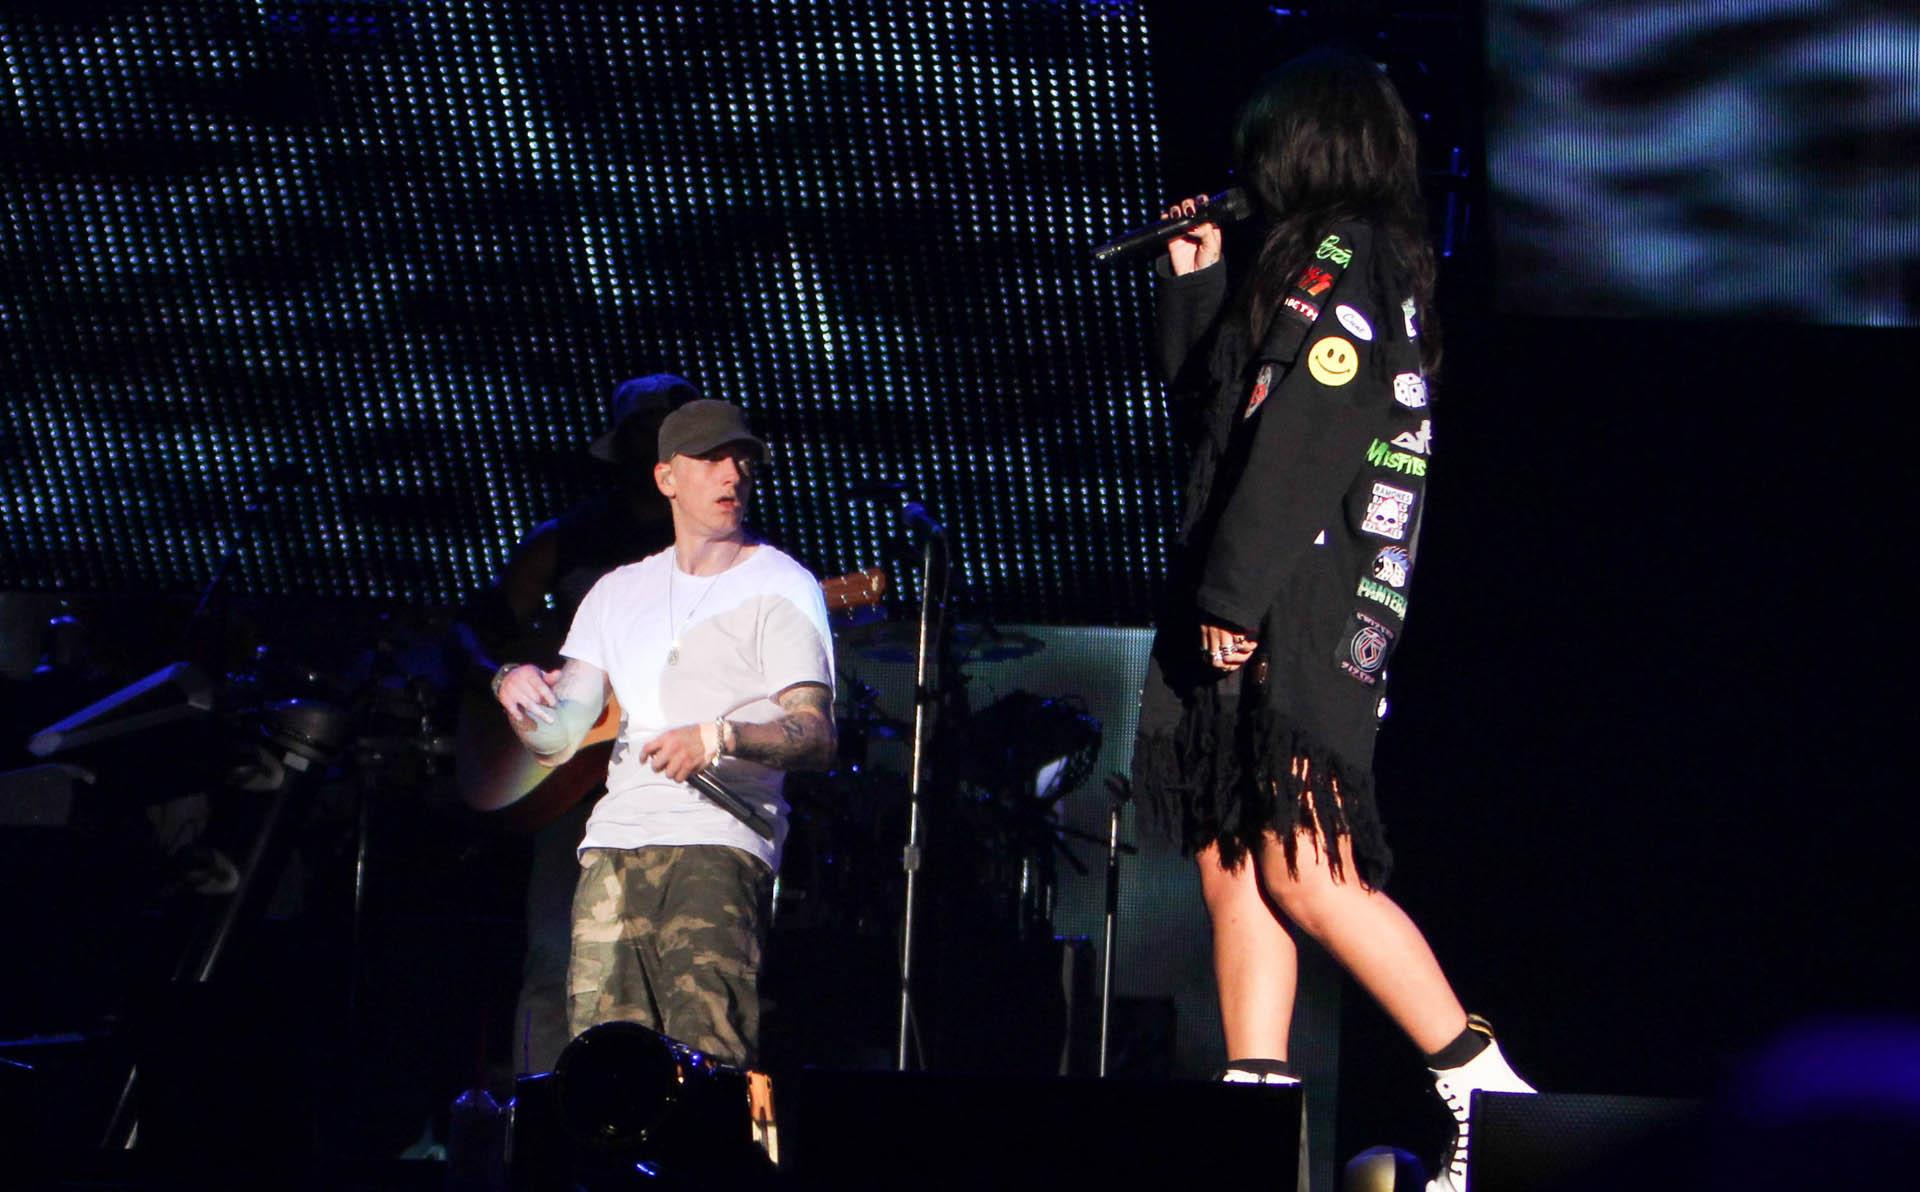 Eminem and Rihanna at The Monster Tour (Rose Bowl 7 aug 2014) 01